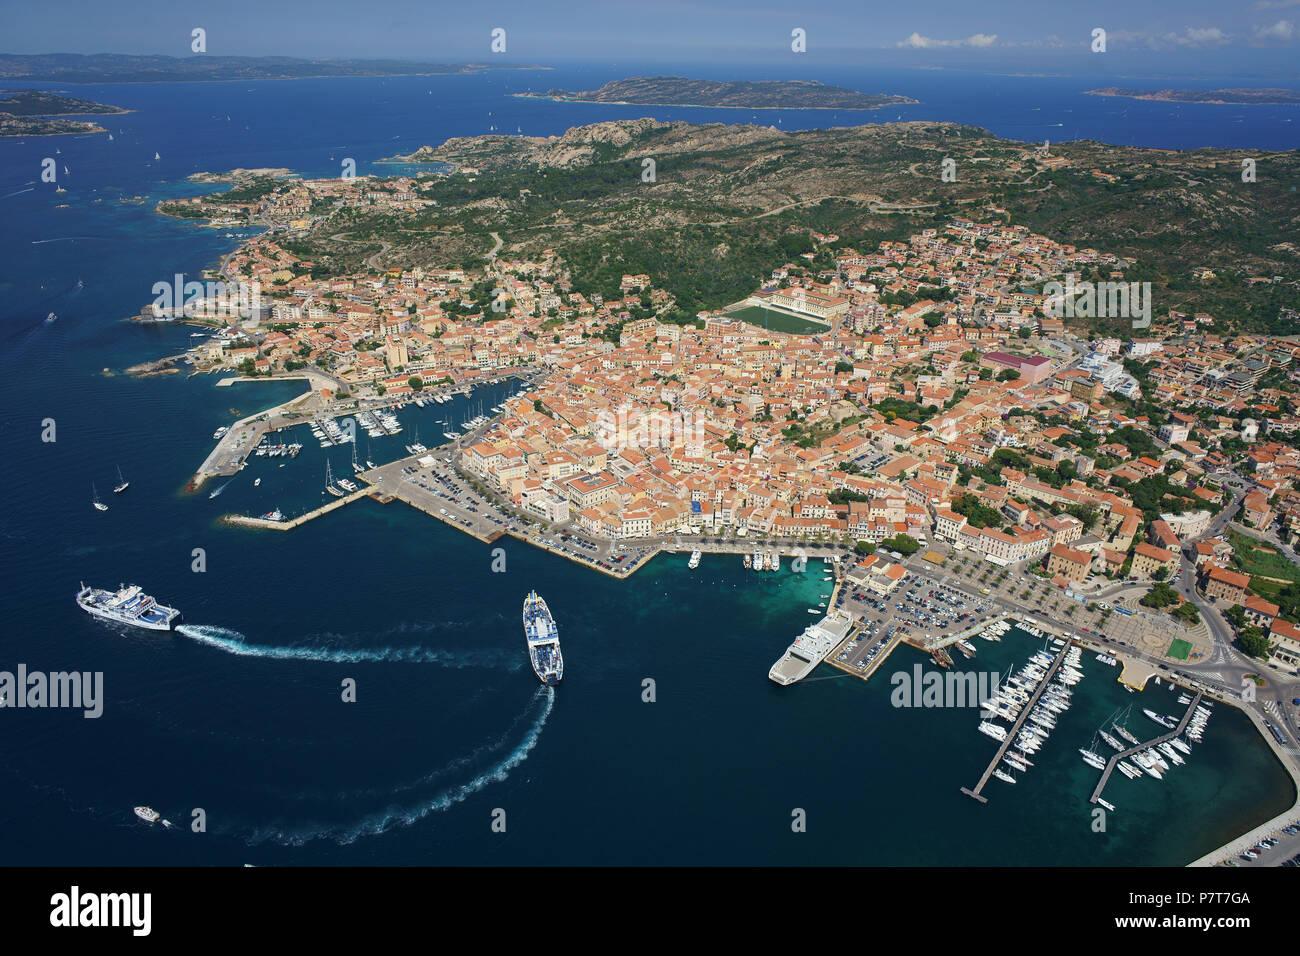 CITY OF LA MADDALENA WITH NON-STOP CAR FERRIES LINKING TO THE MAIN ISLAND OF SARDINIA (aerial view). Province of Olbia-Tempio, Sardinia, Italy. Stock Photo